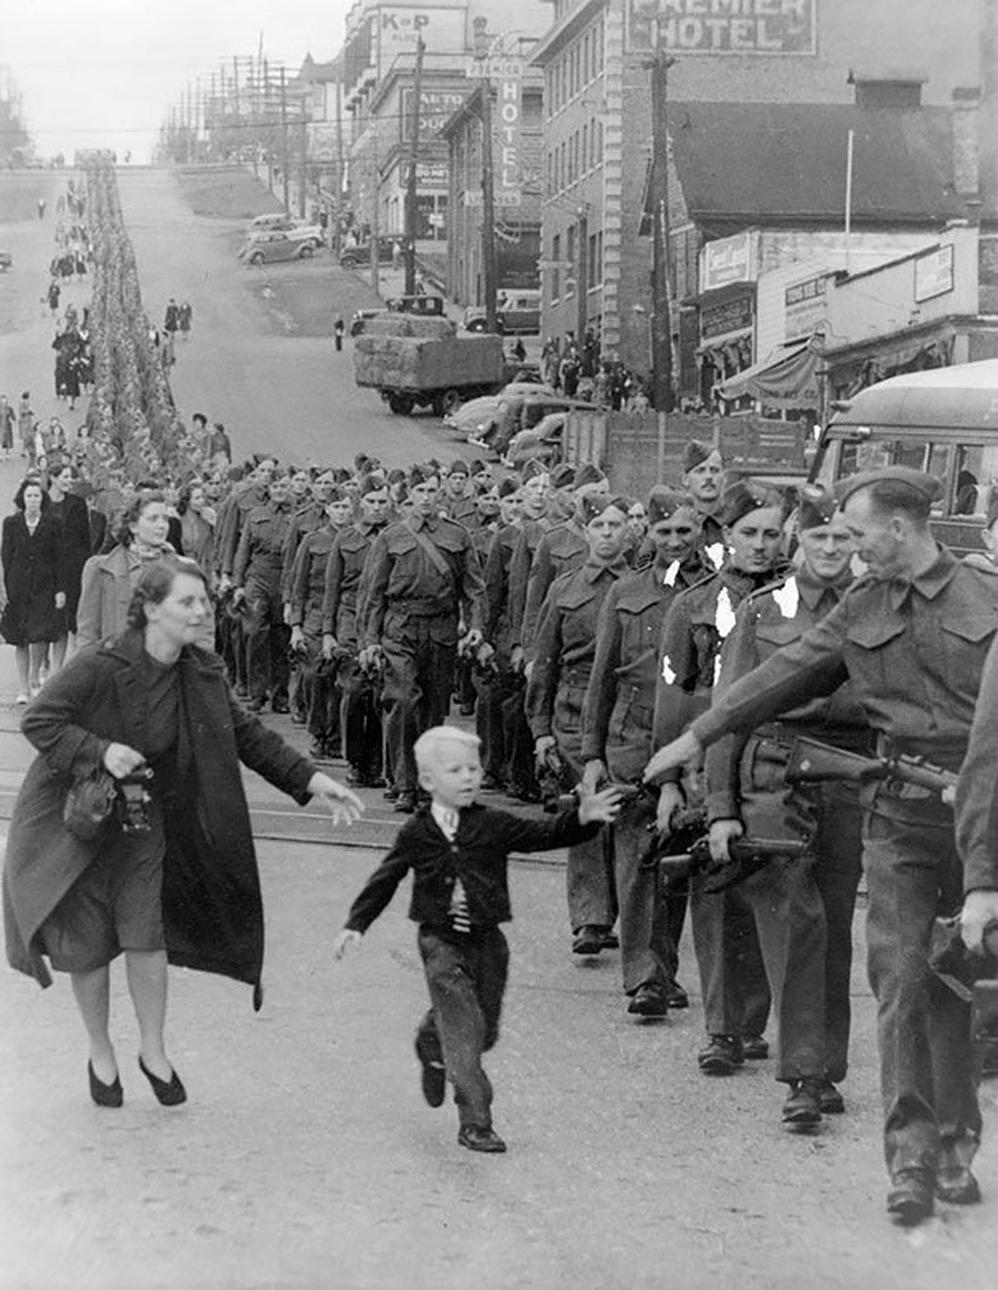 'Espérame papá', de Claude P. Dettloff en New Westminster, Canadá, 01 de octubre de 1940